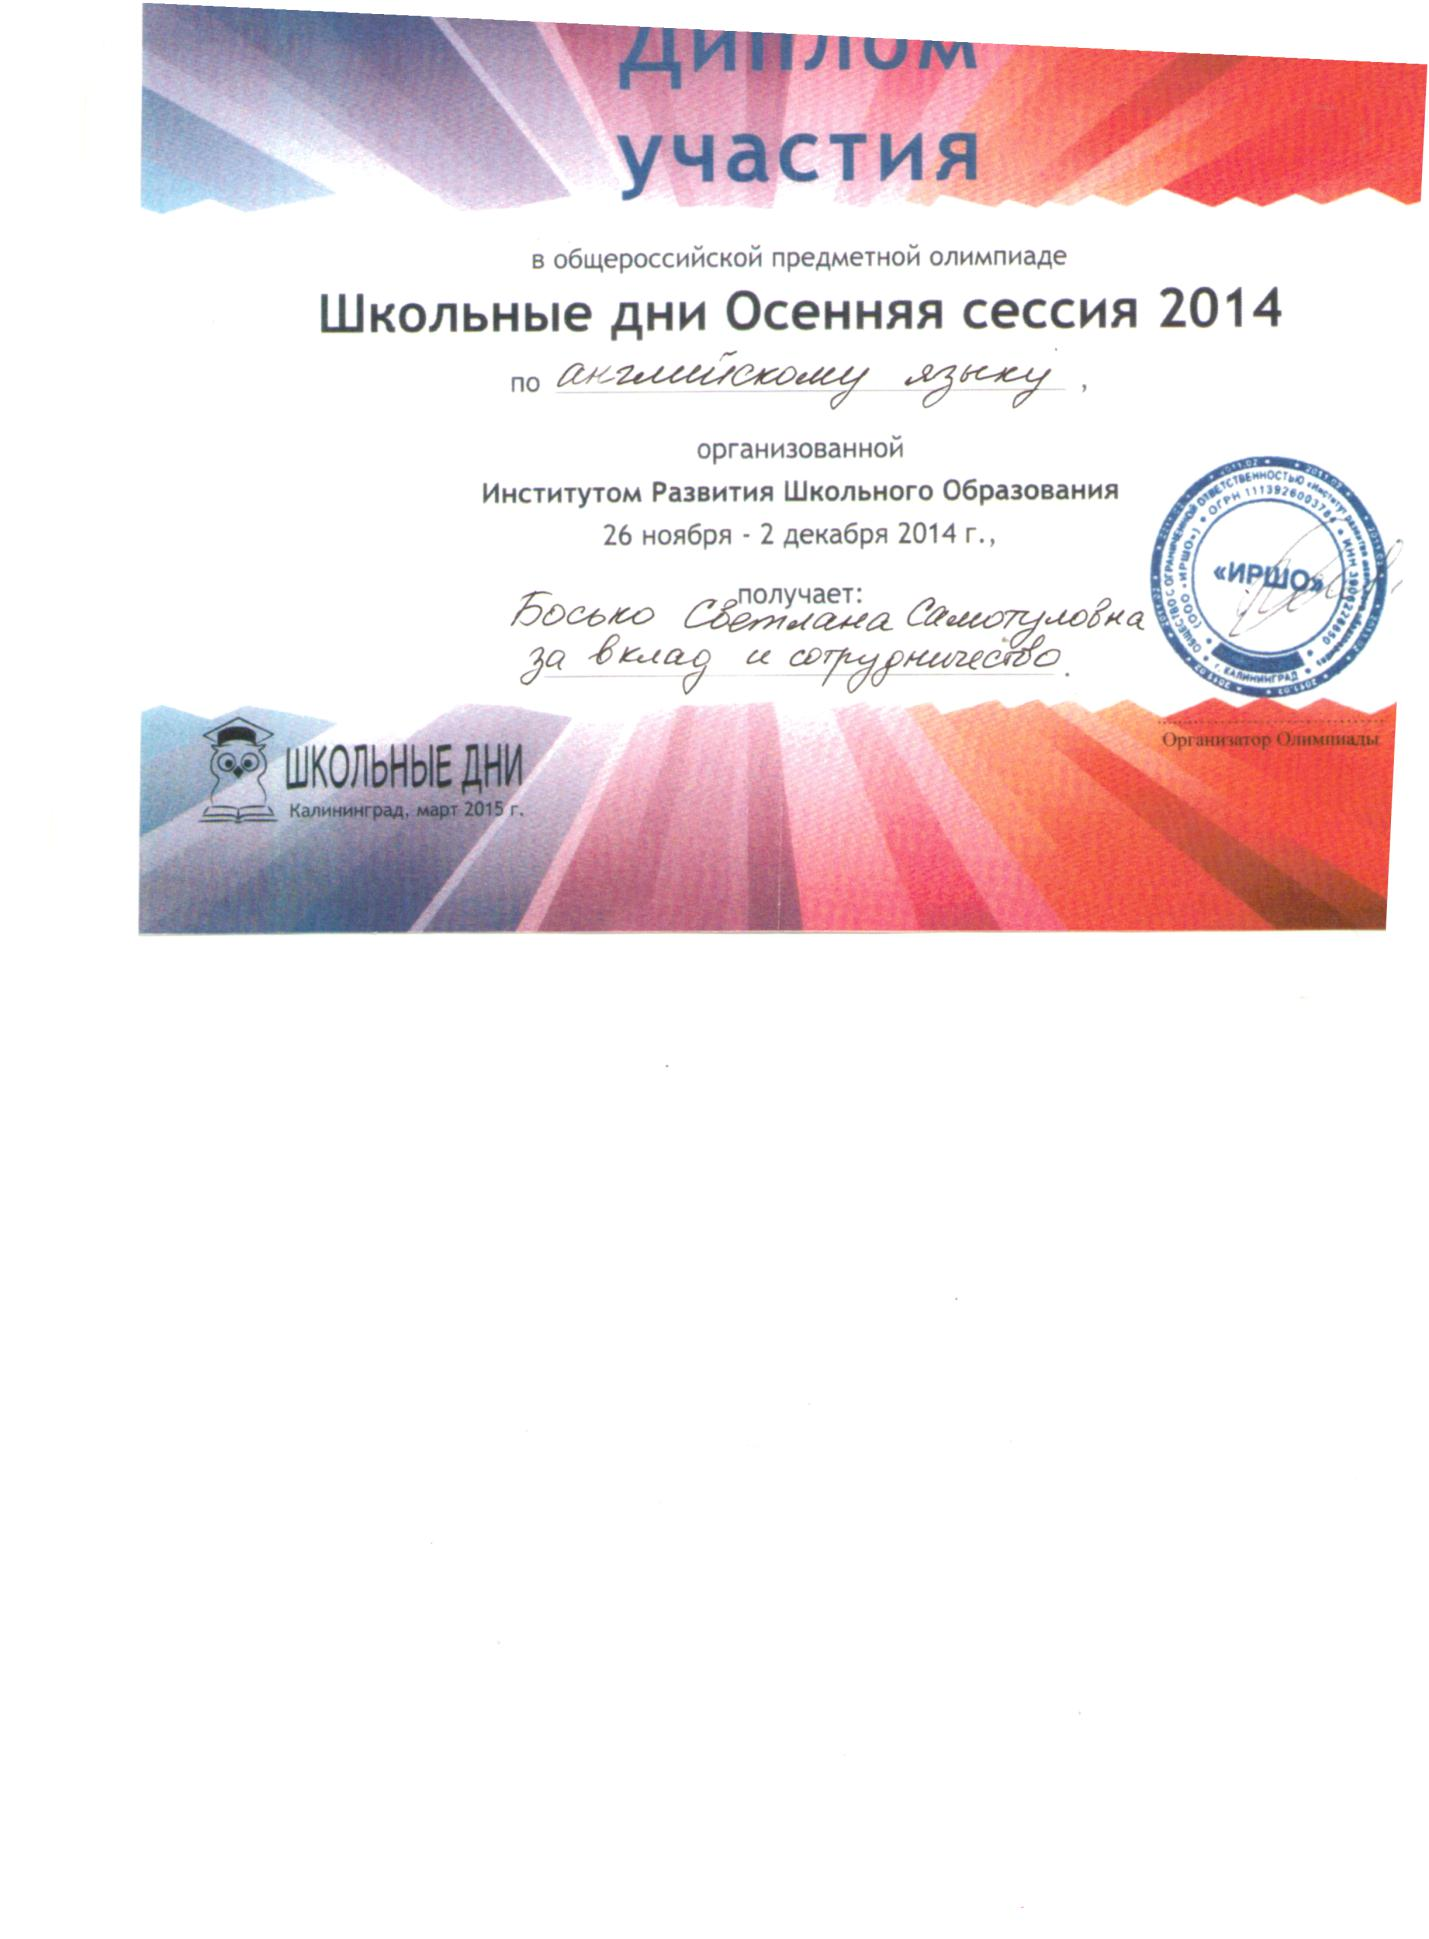 C:\Documents and Settings\Светлана Саматуловна\Рабочий стол\квалификация\15 диплом.tif